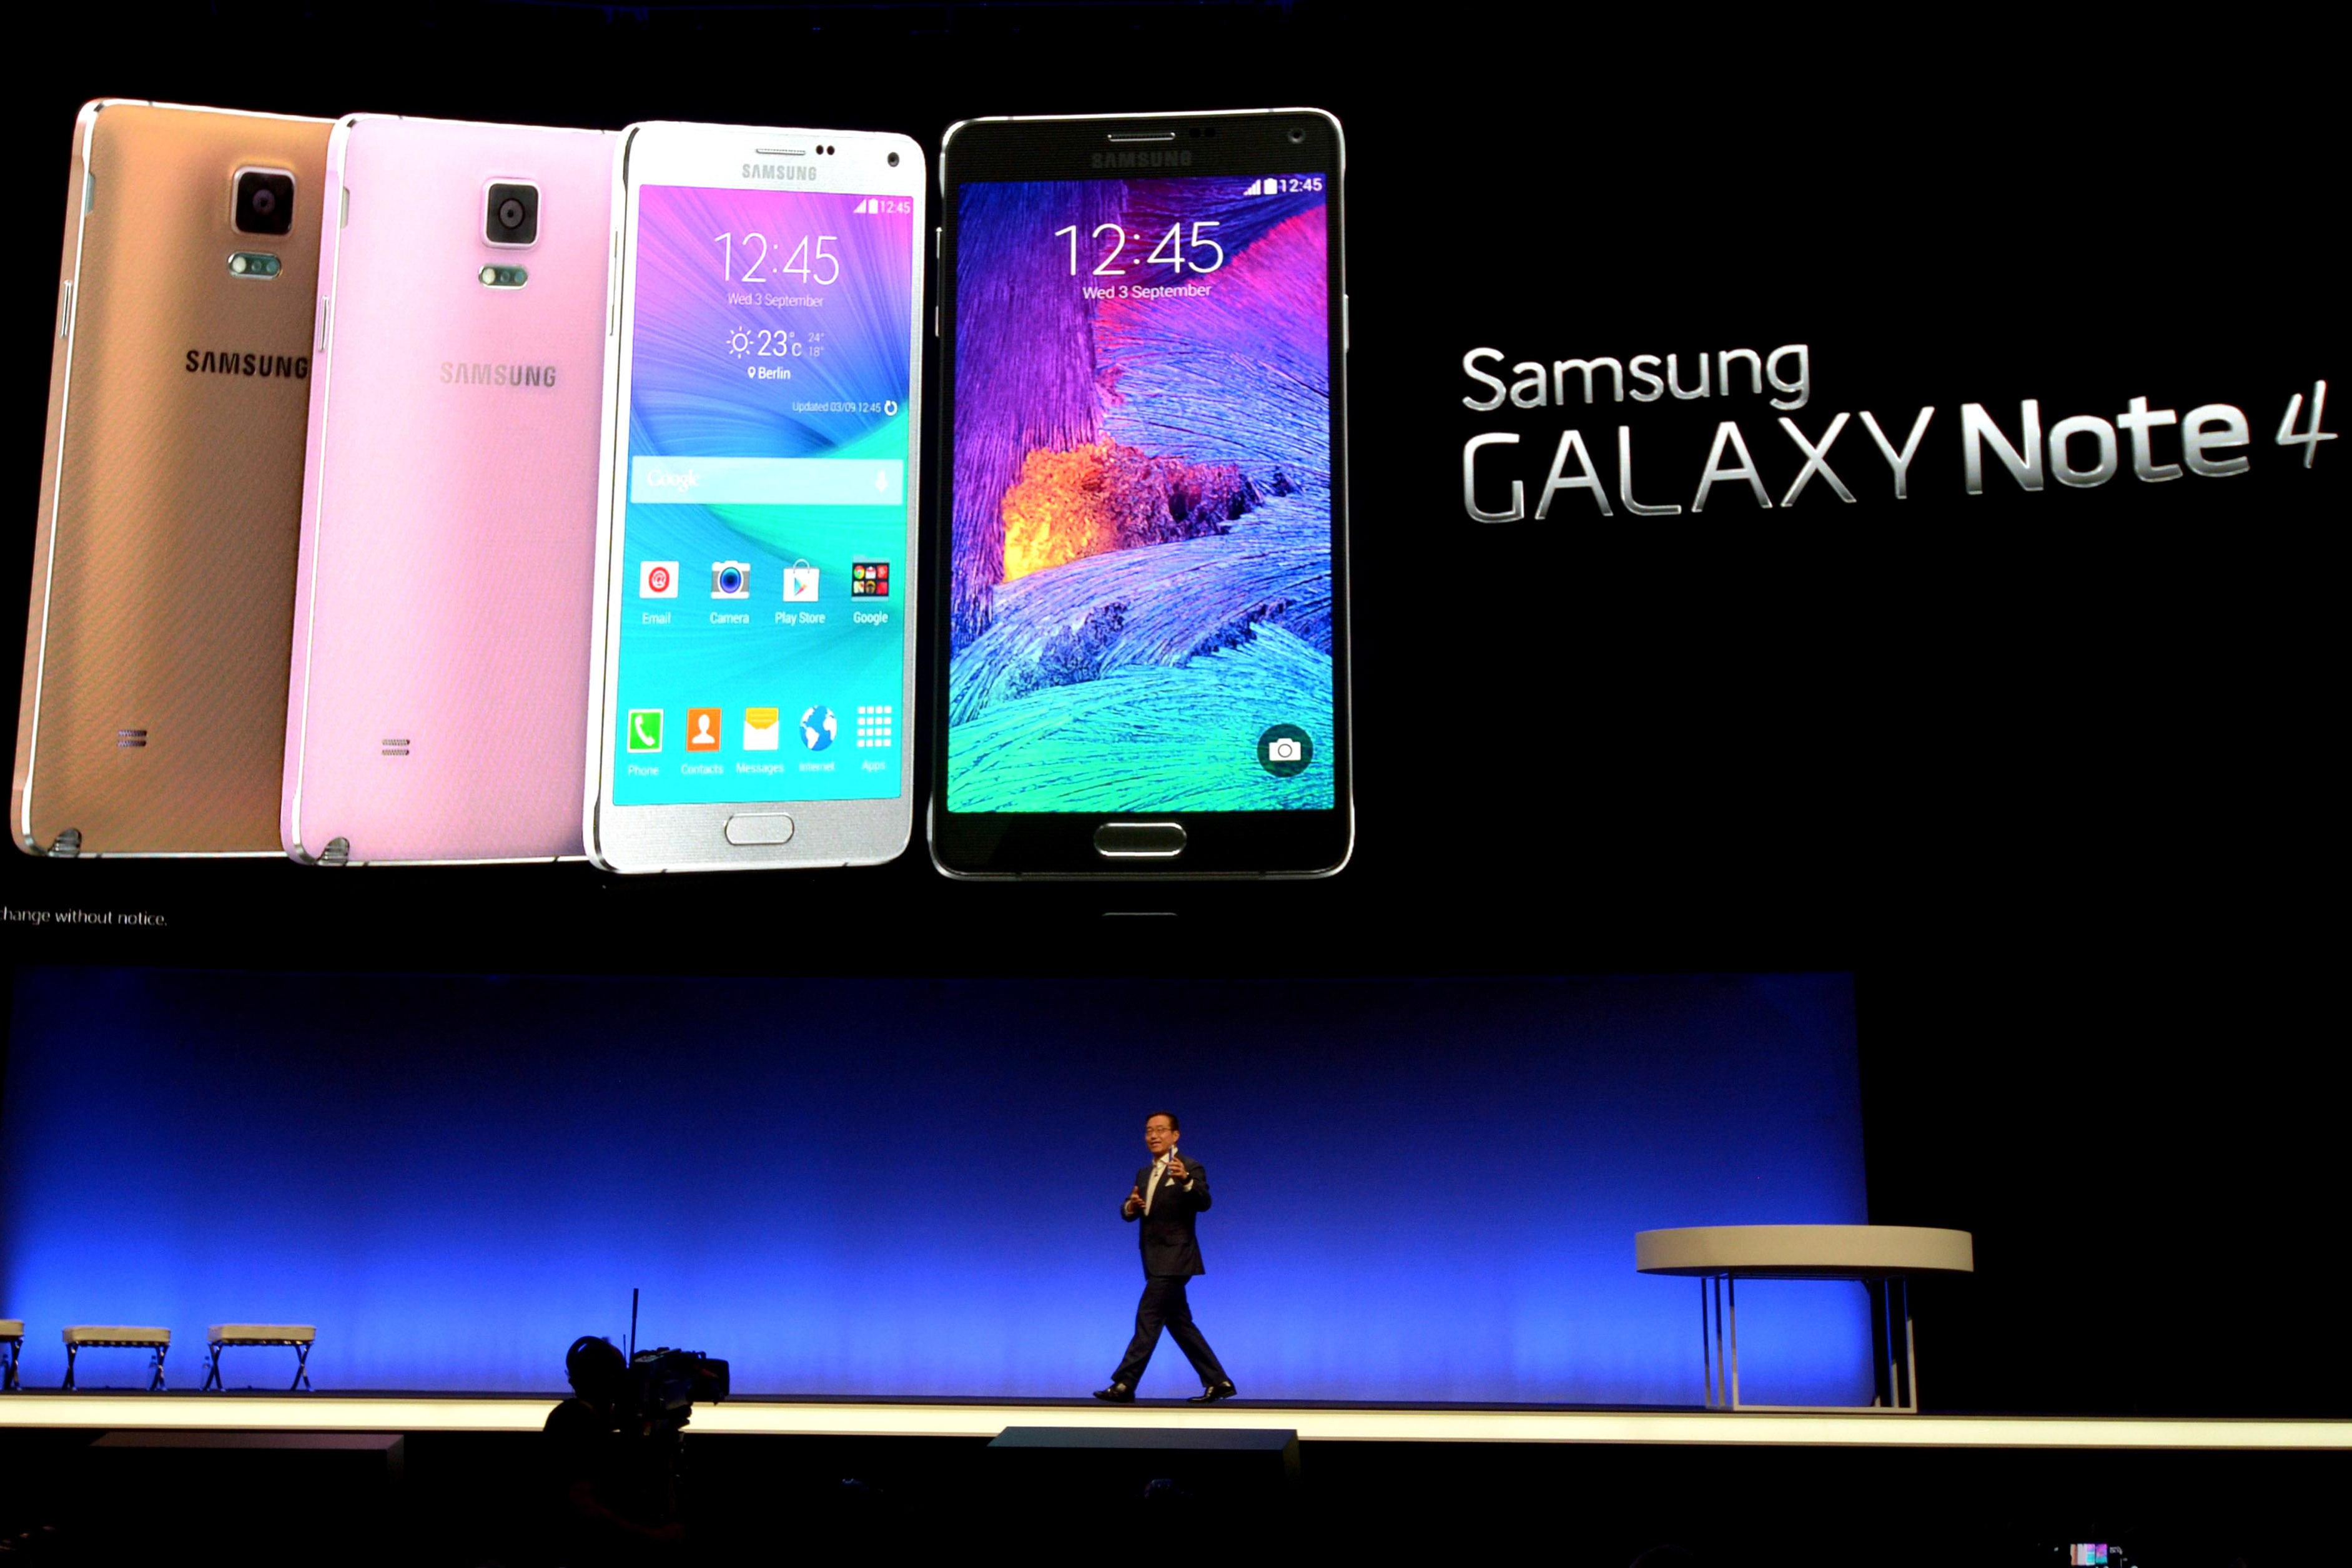 Galaxy Note 4 Wallpaper Hd Wallpapersafari